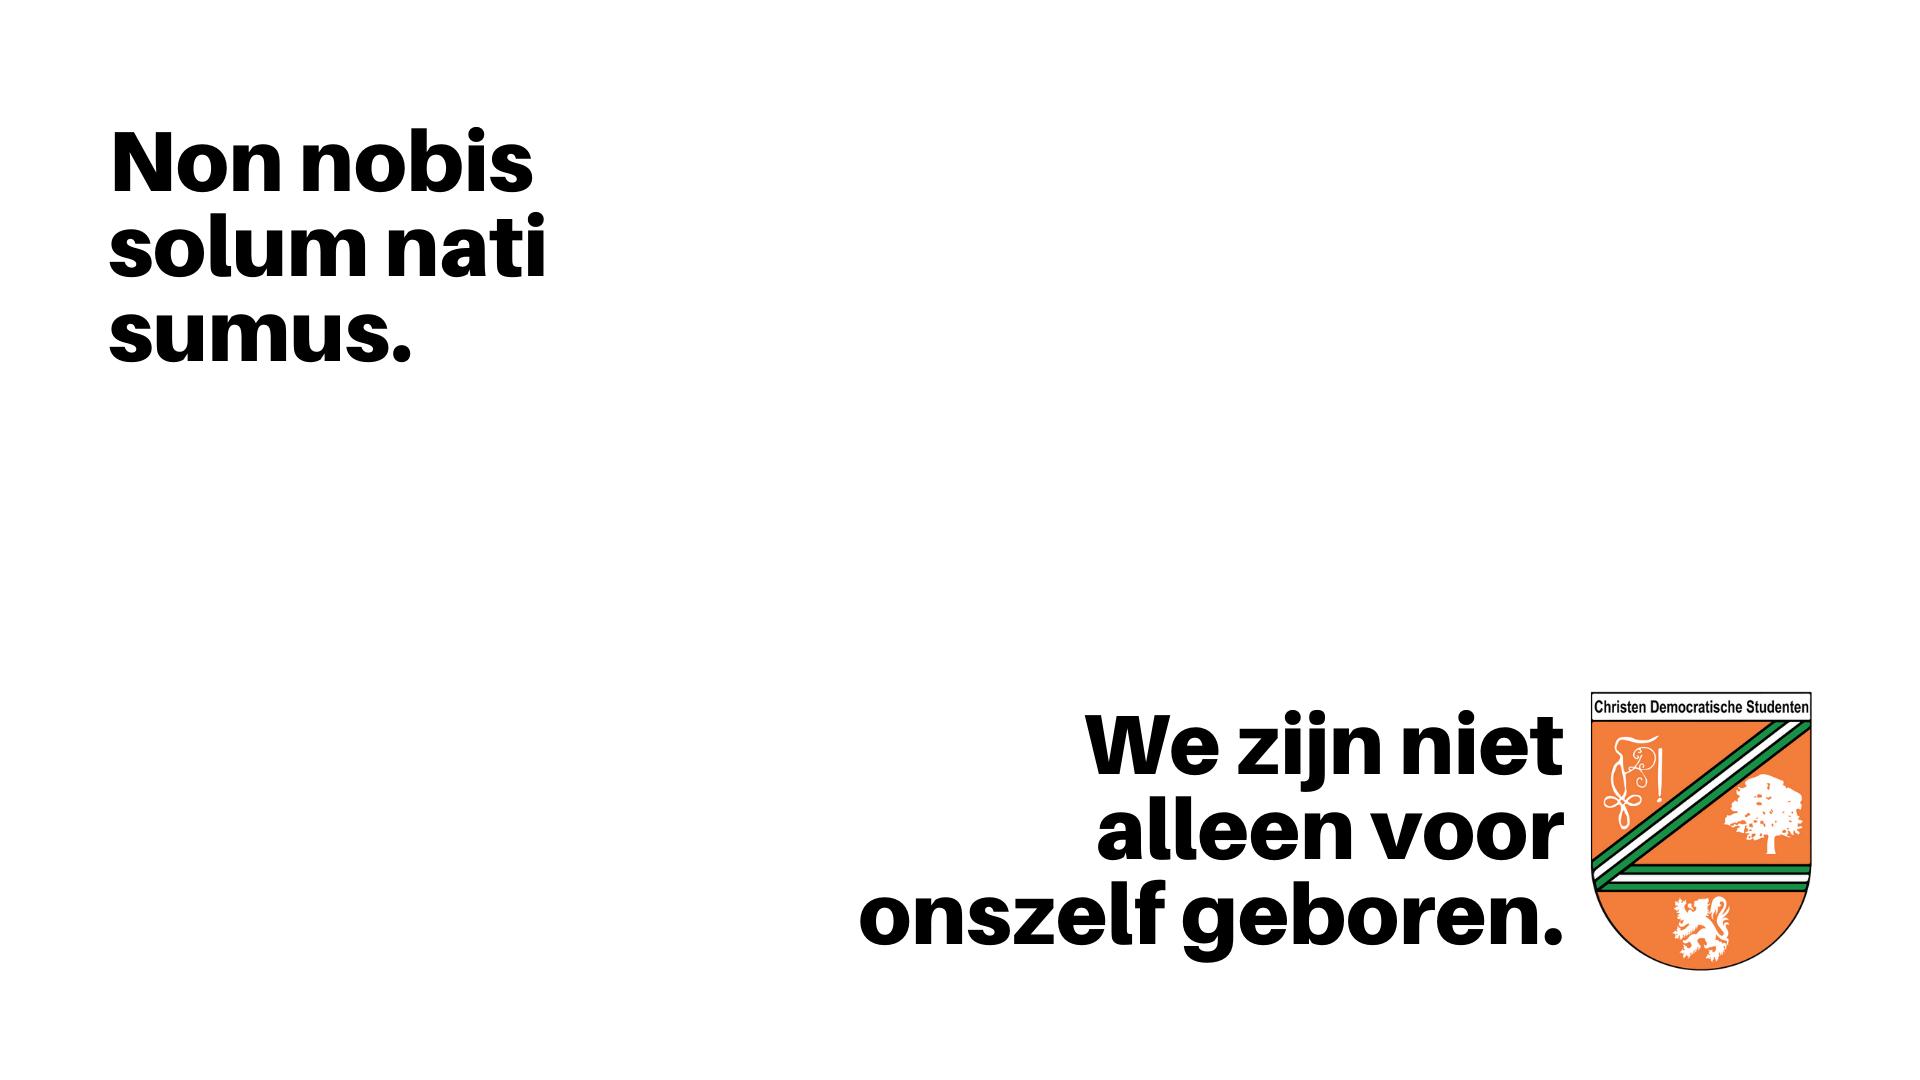 CDS kiest wapenspreuk: 'Non nobis solum nati sumus'